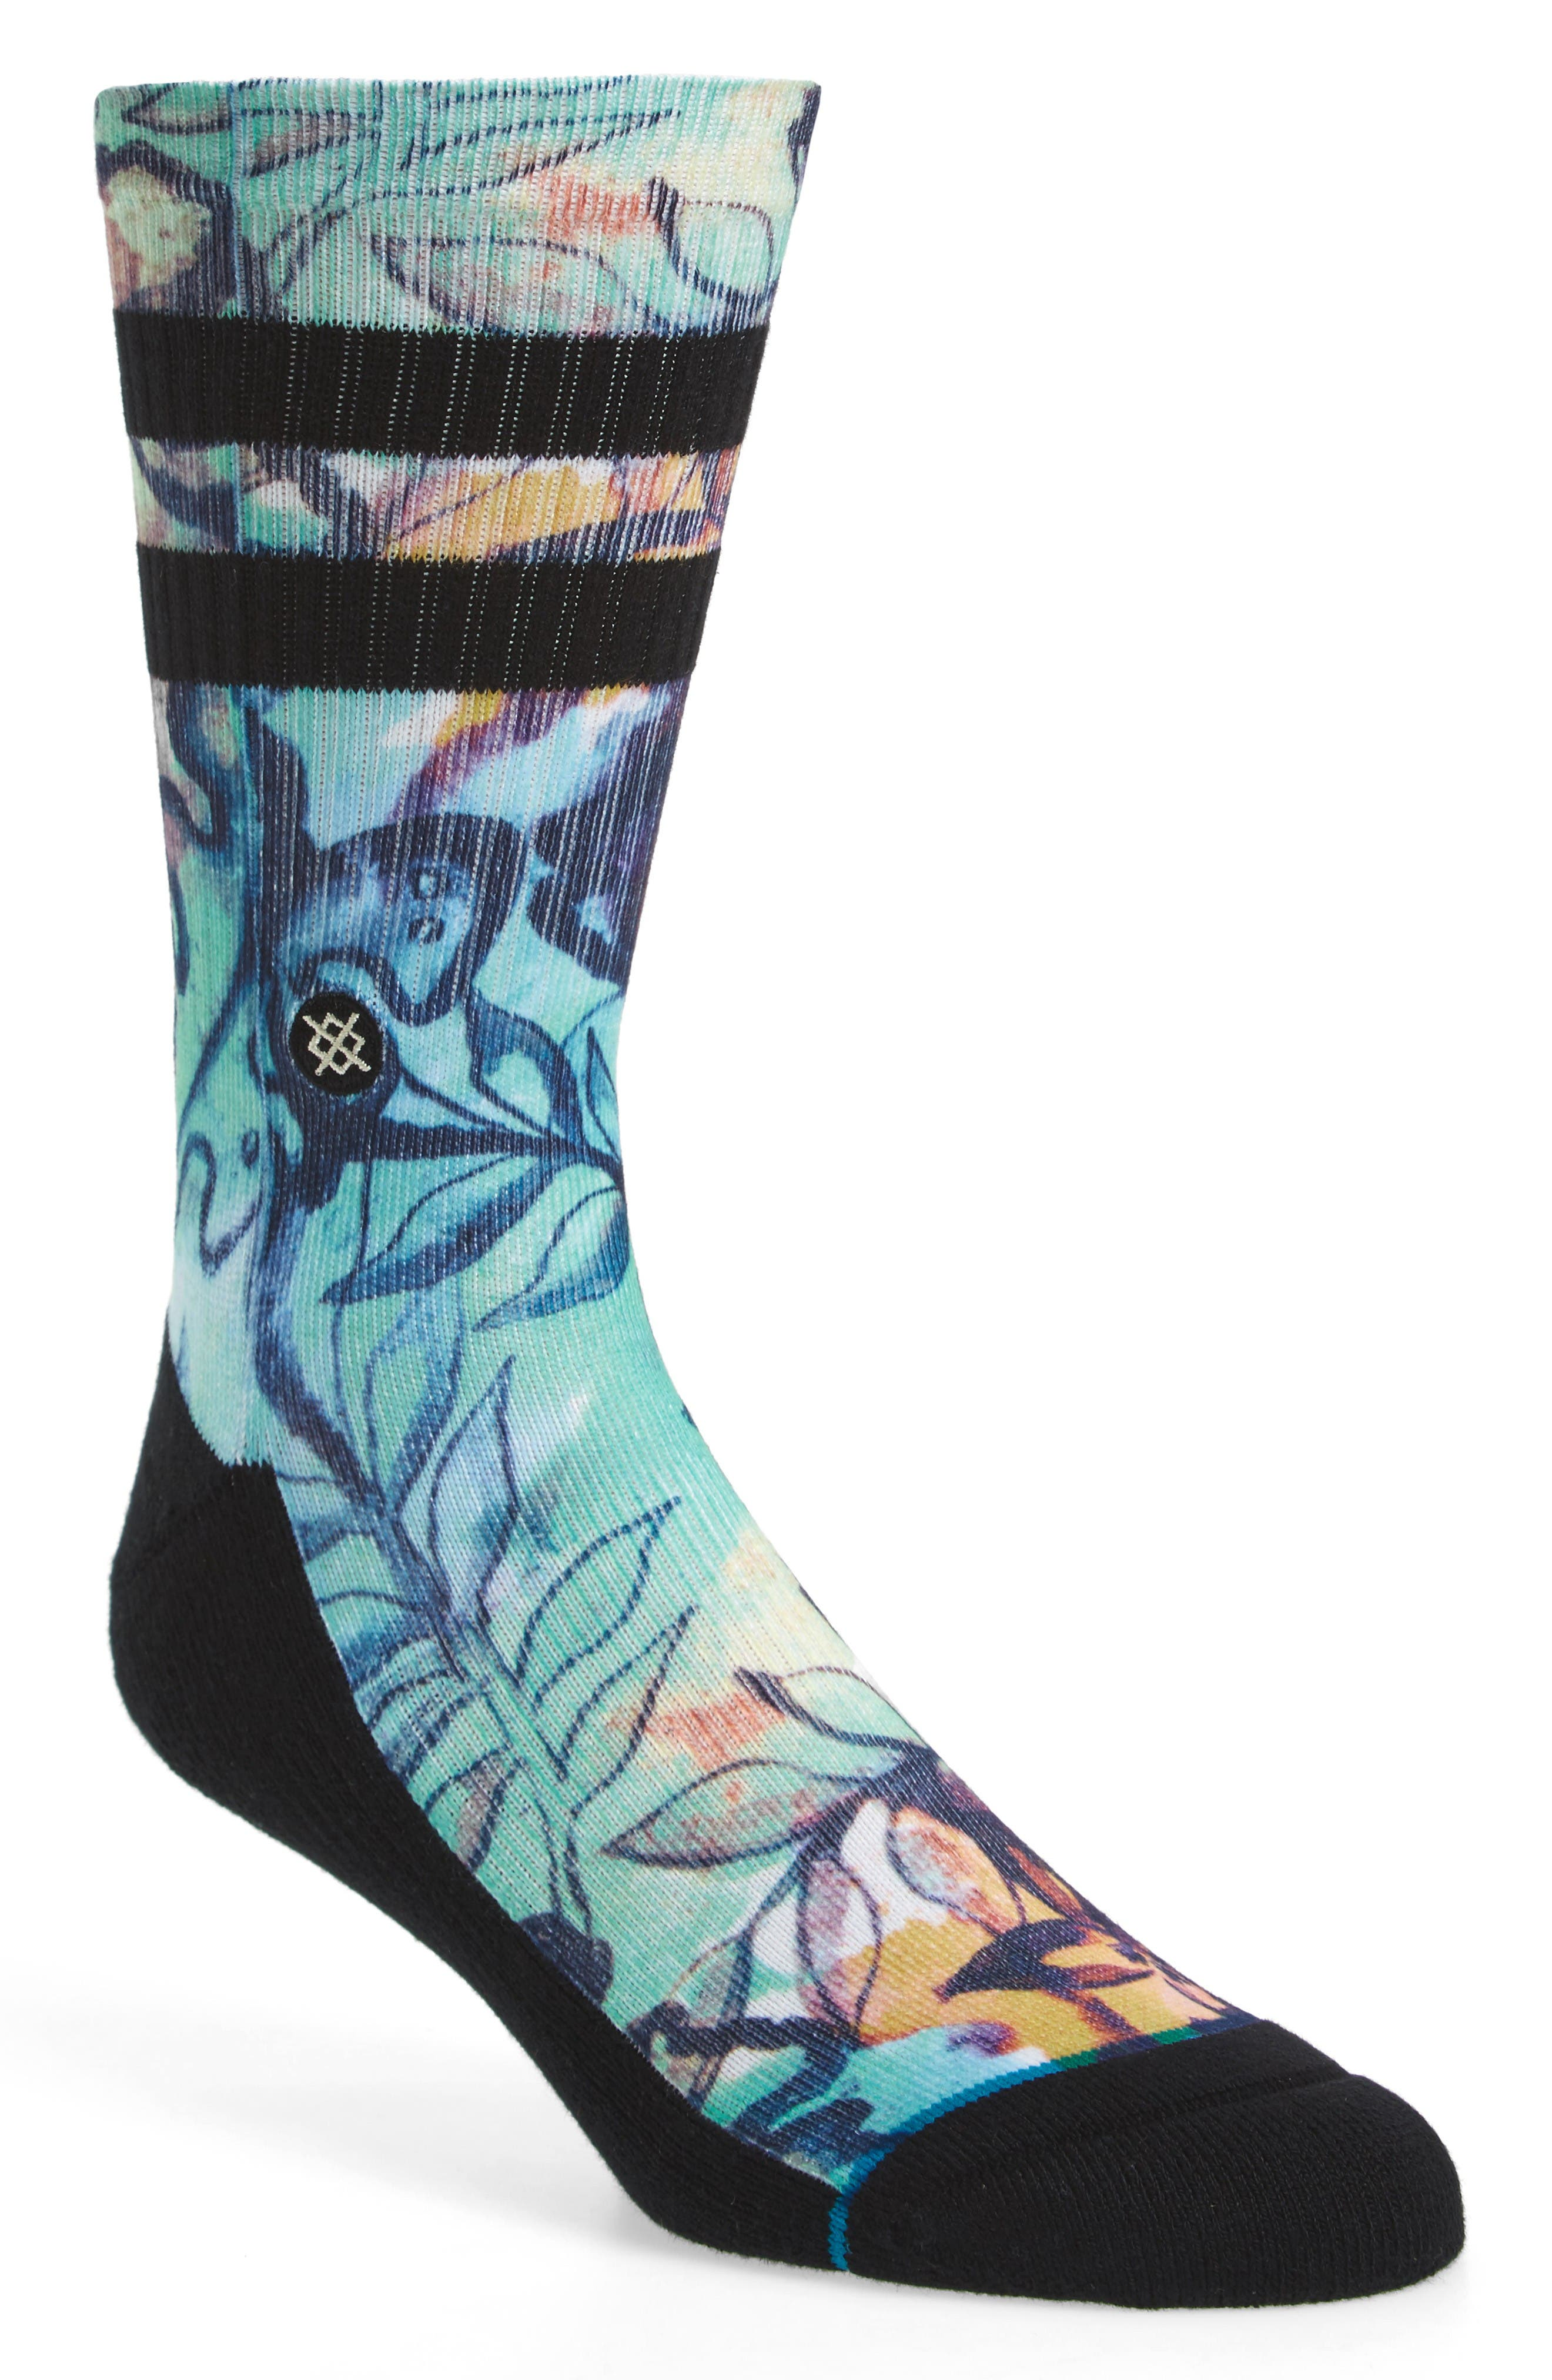 Durangoh Socks,                         Main,                         color, Blue